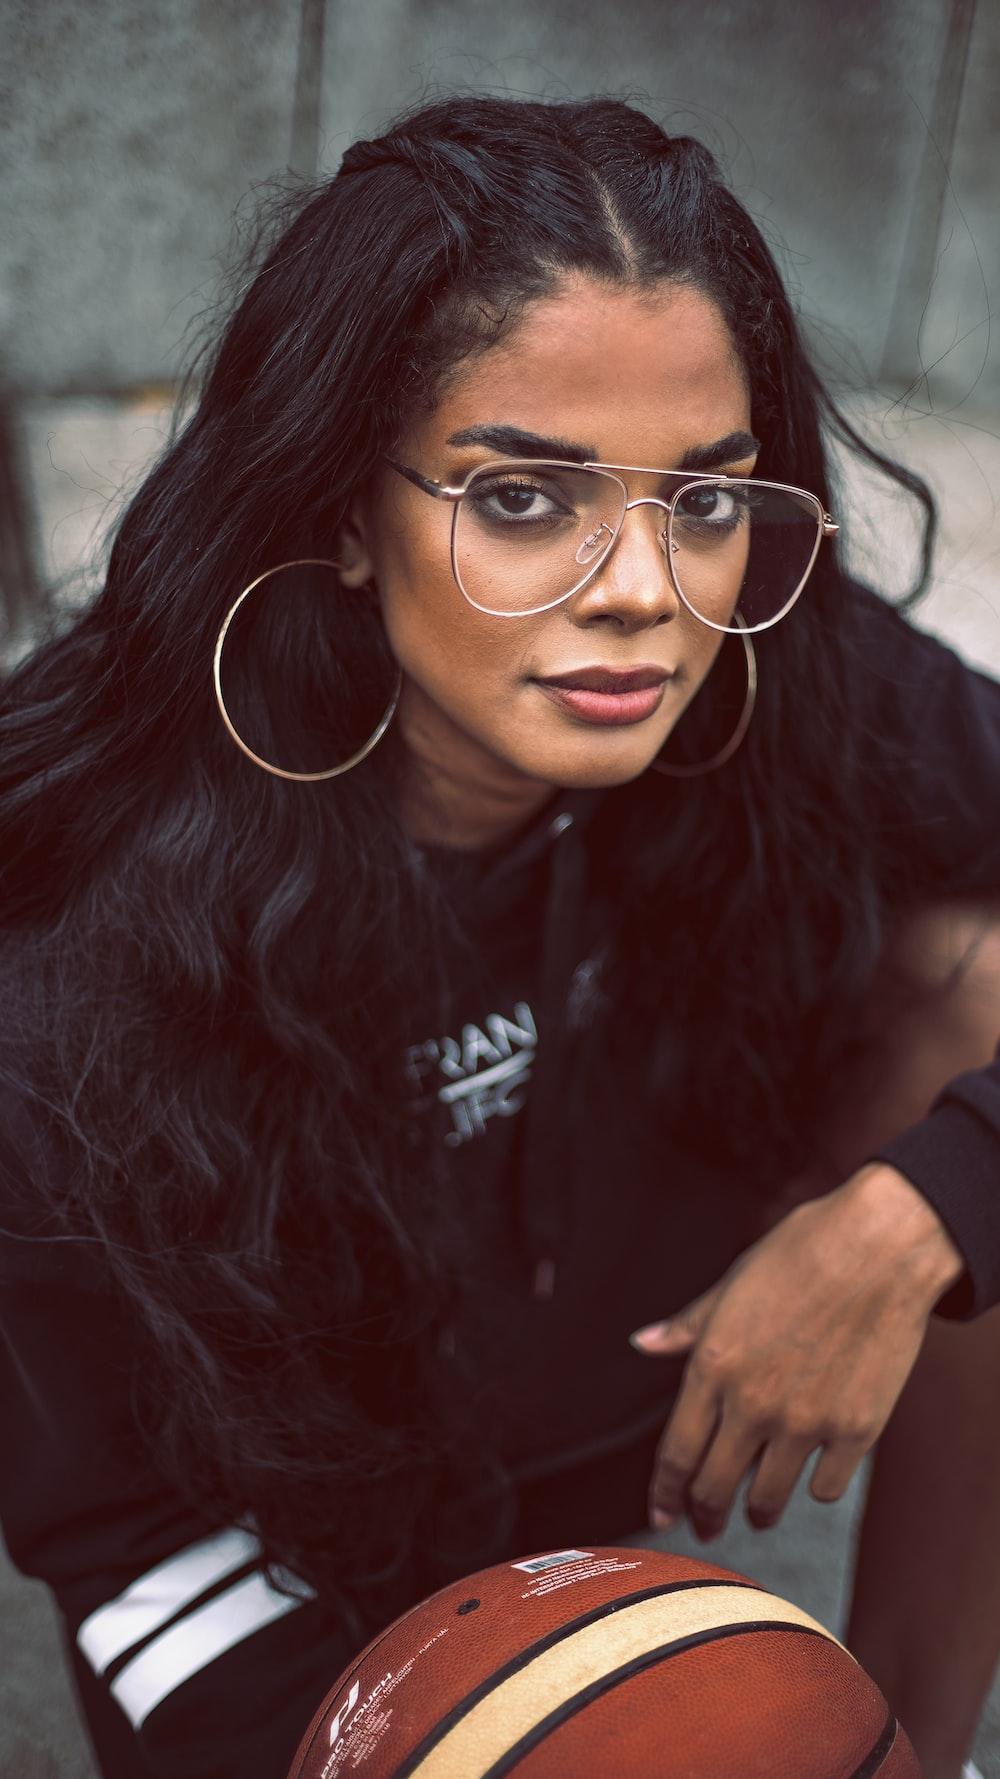 woman in black crew neck t-shirt wearing eyeglasses